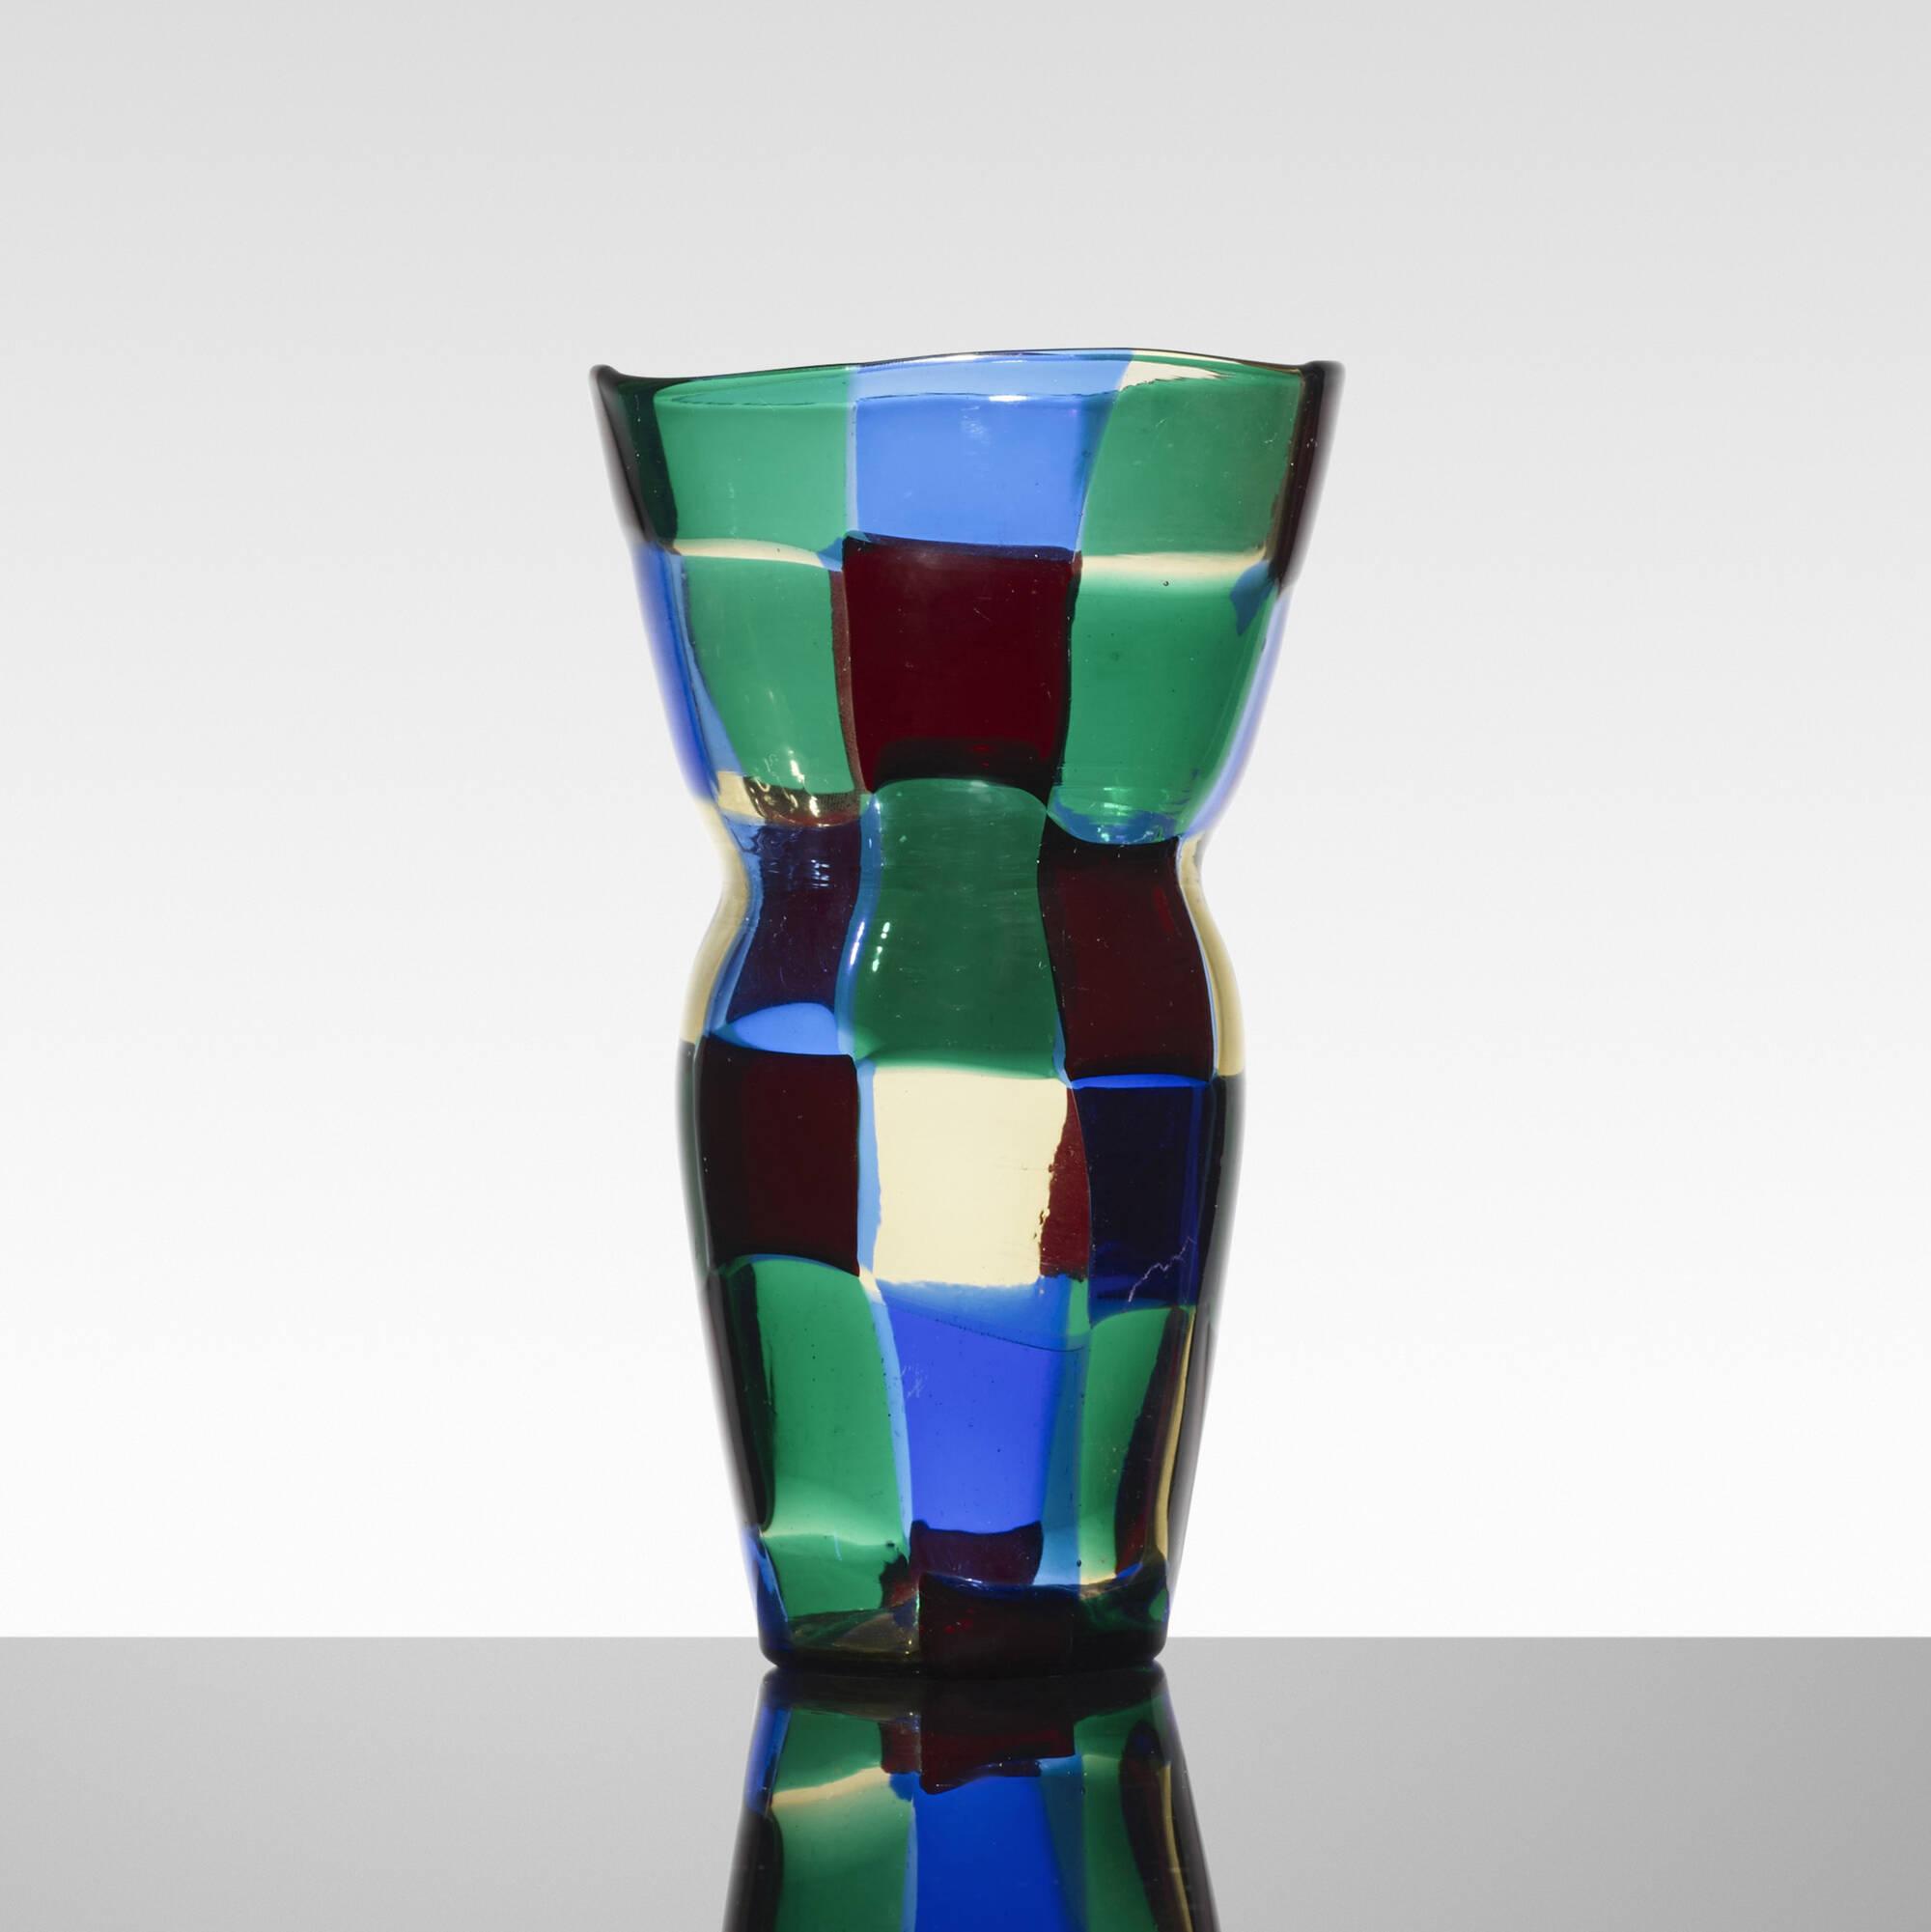 143: Fulvio Bianconi / Pezzato vase, model 4402 (2 of 2)